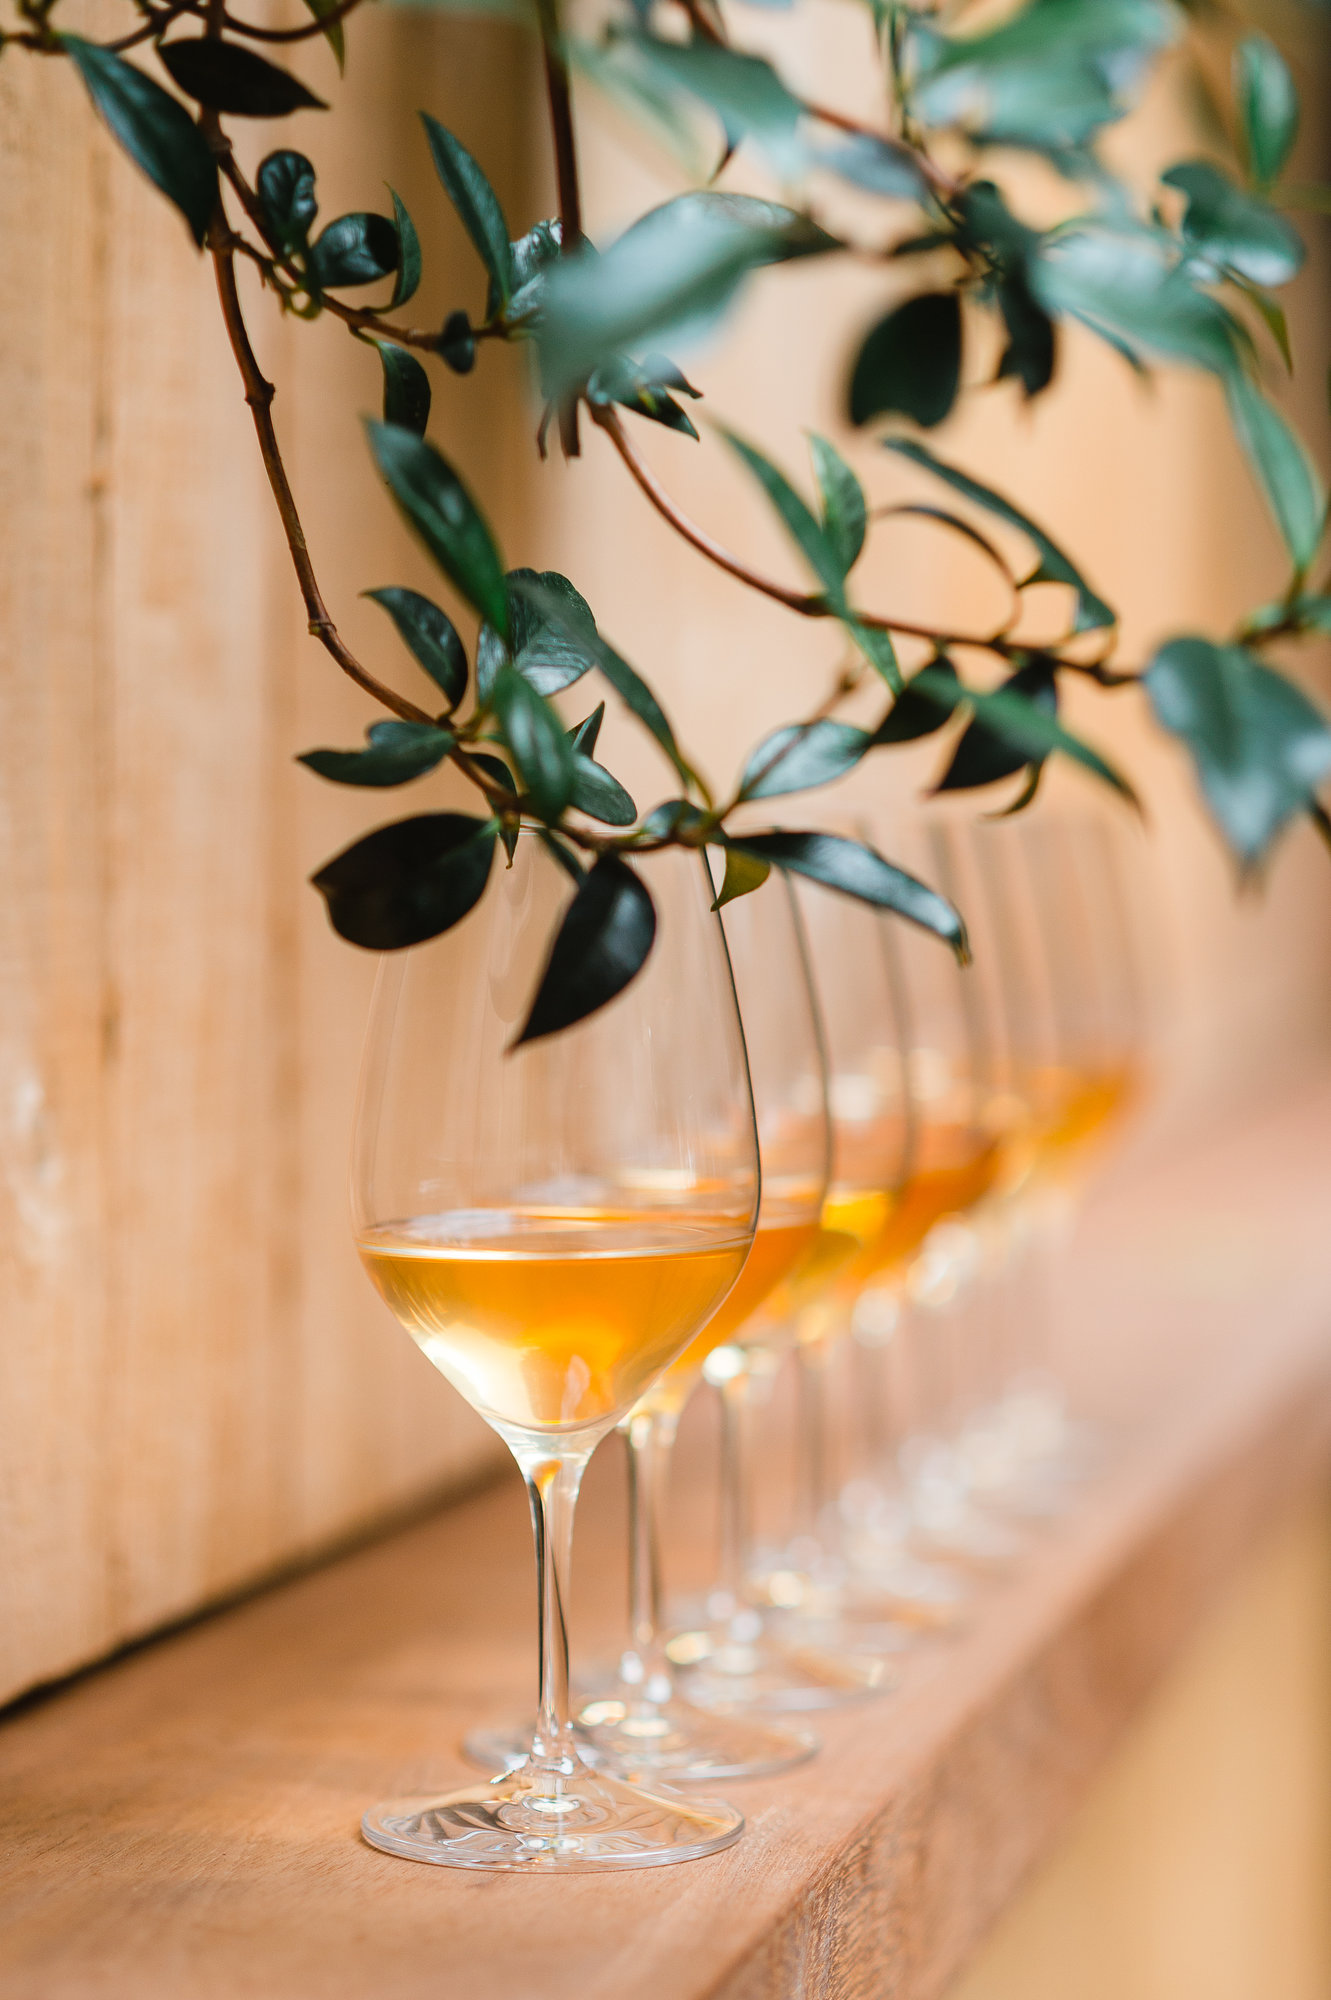 Imbibe's Orange Wine Tasting